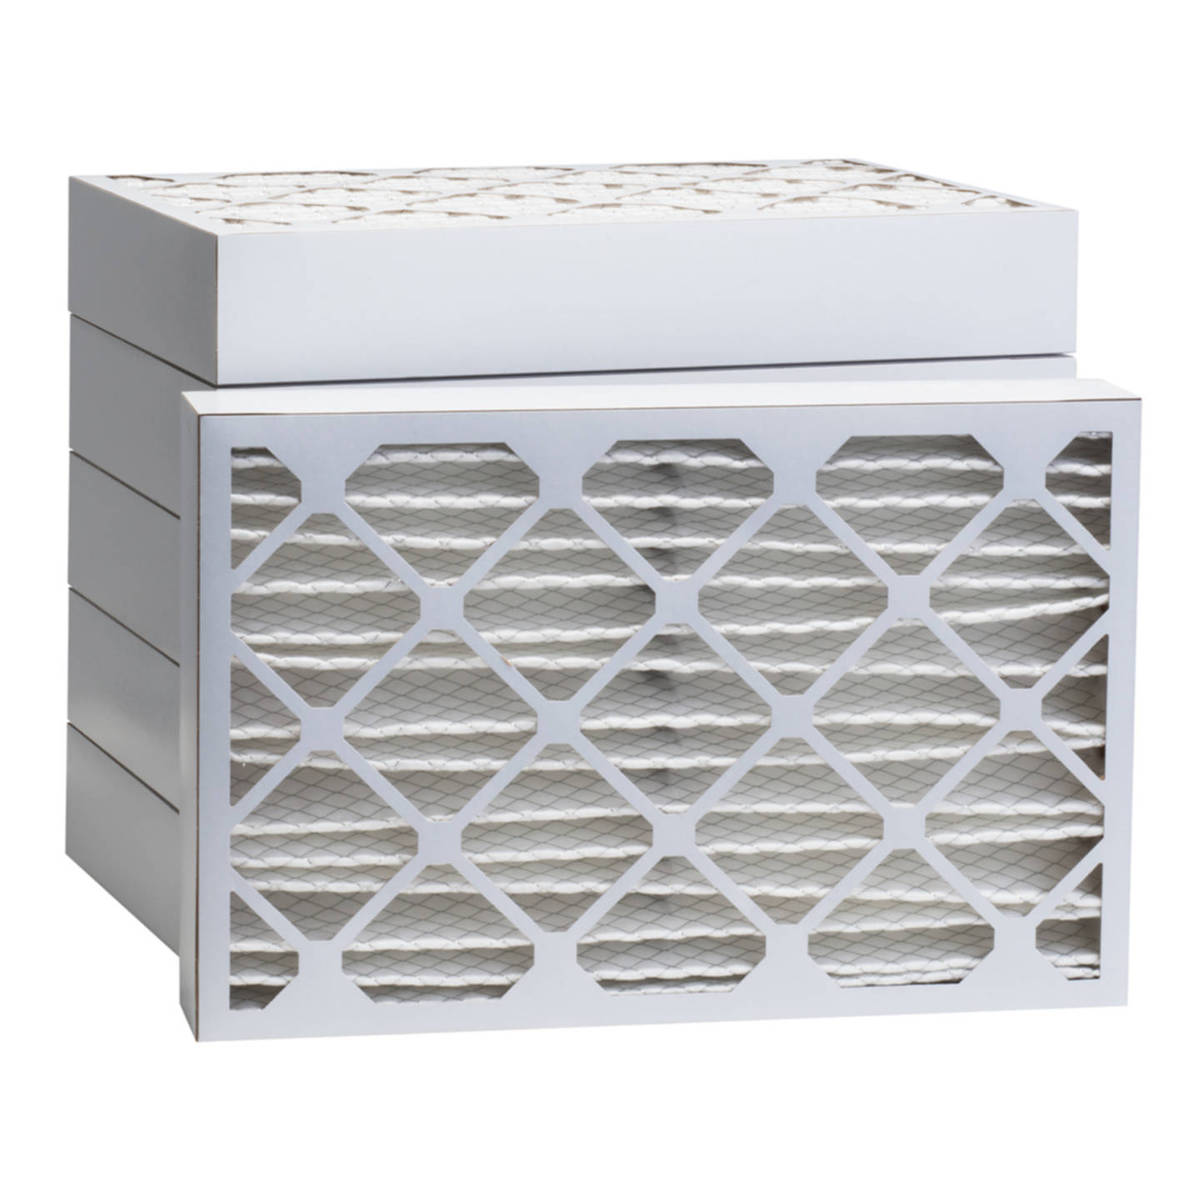 20x25x4 Ultimate MERV 13 Air Filter / Furnace Filter Replacement.